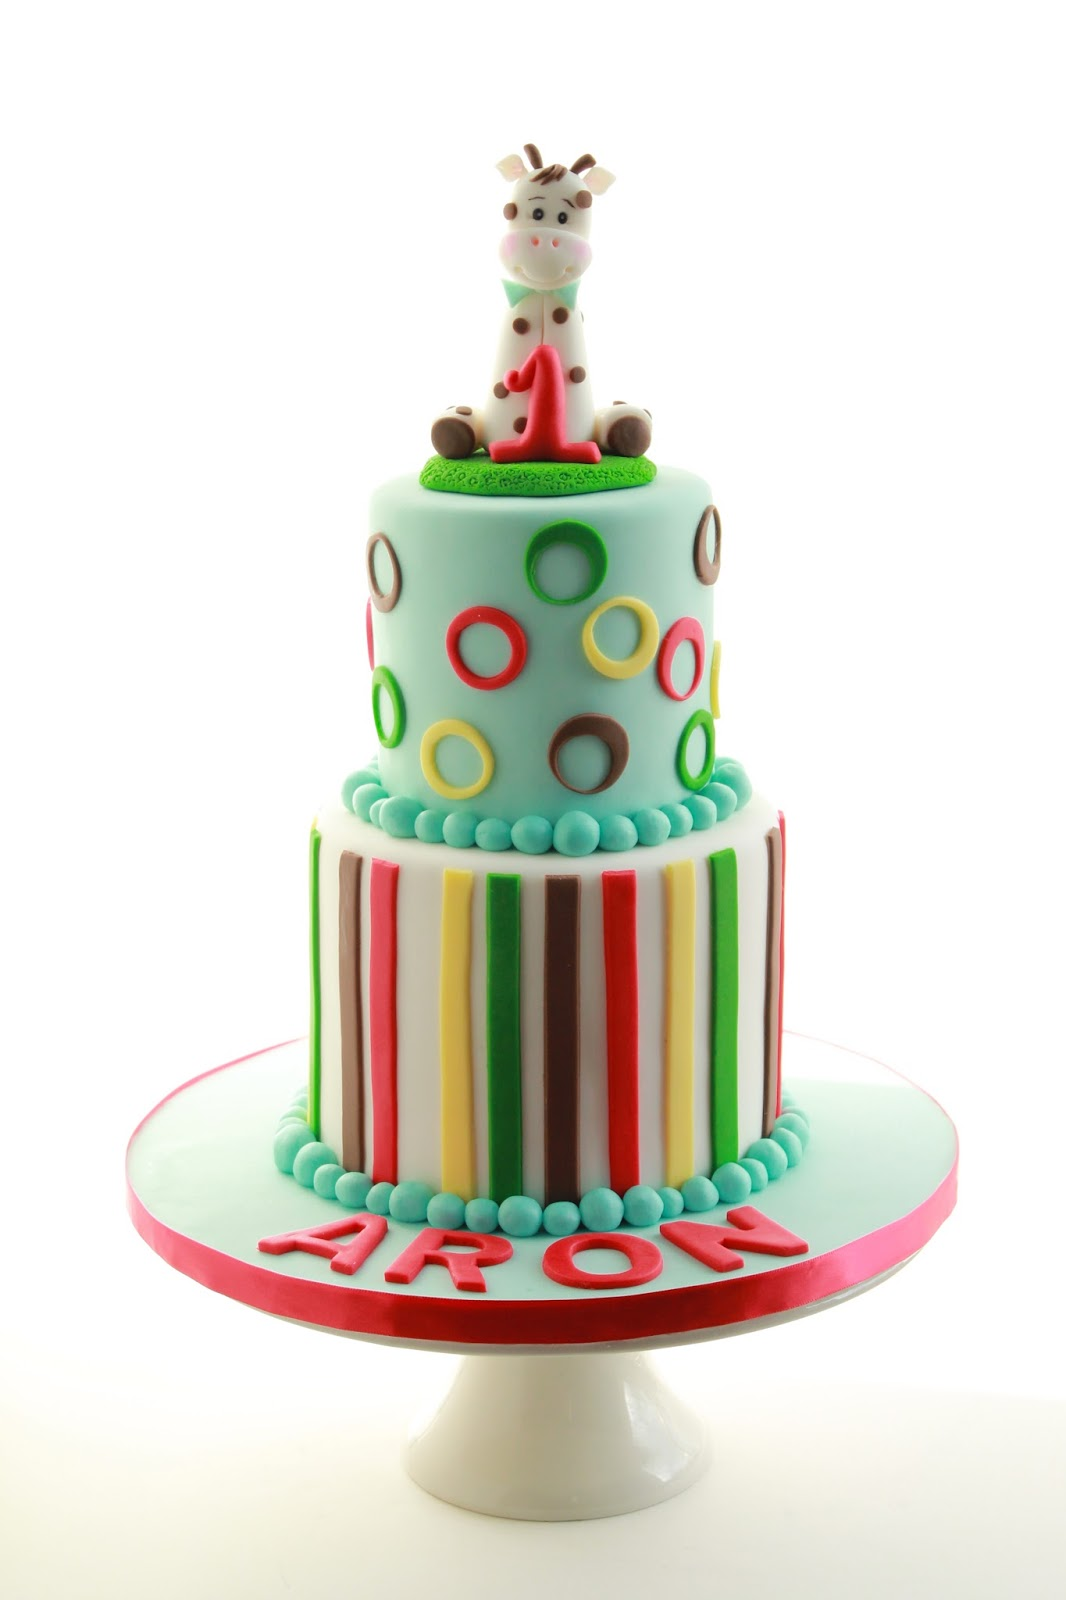 10 Creative 1st Birthday Cake Ideas Sweet Avenue Cakery